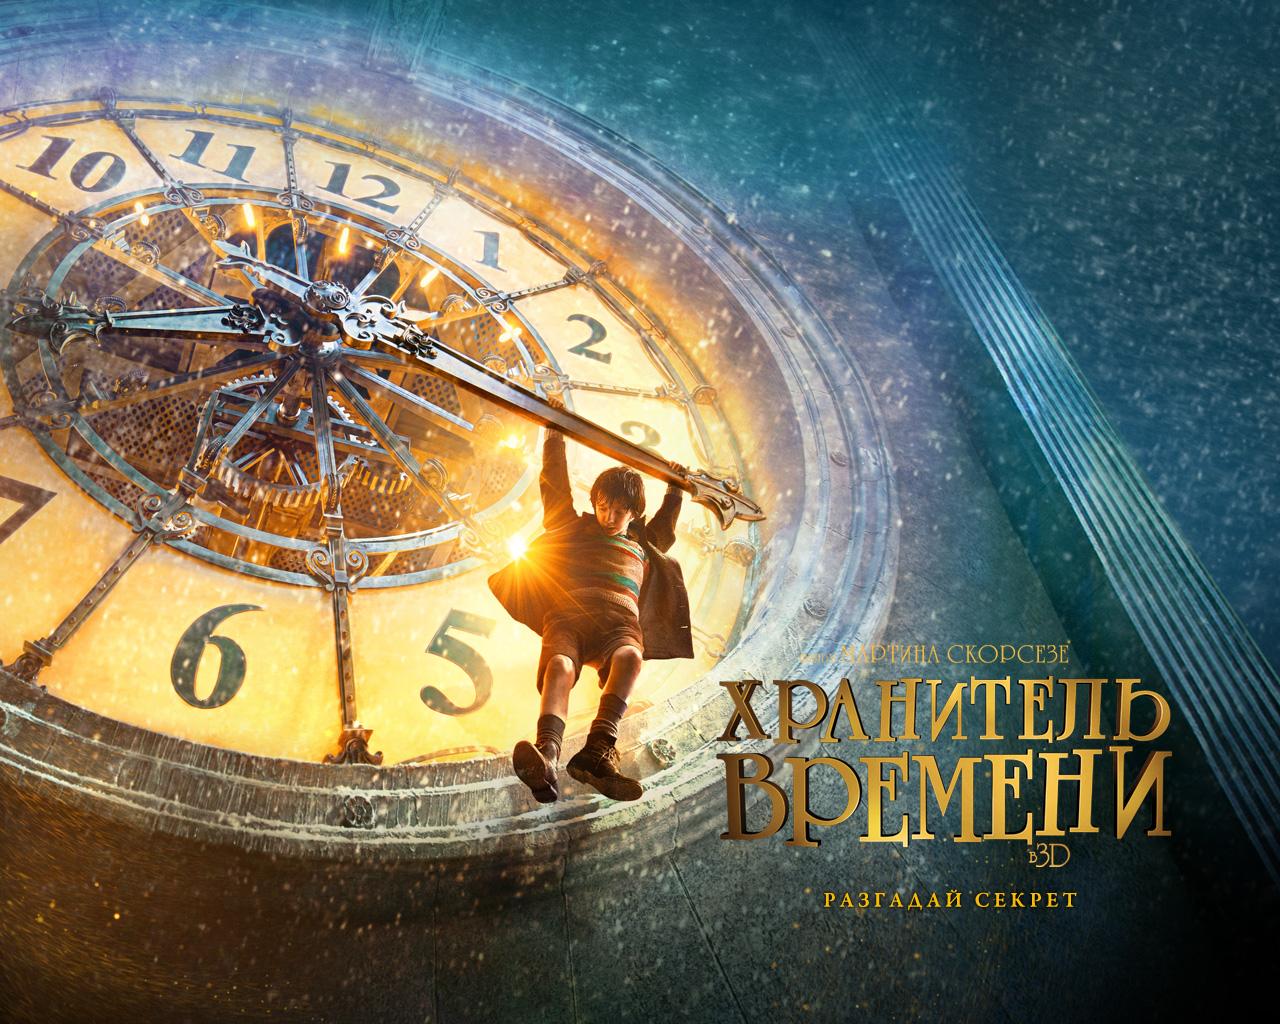 http://file.mobilmusic.ru/e4/0b/86/954555.jpg